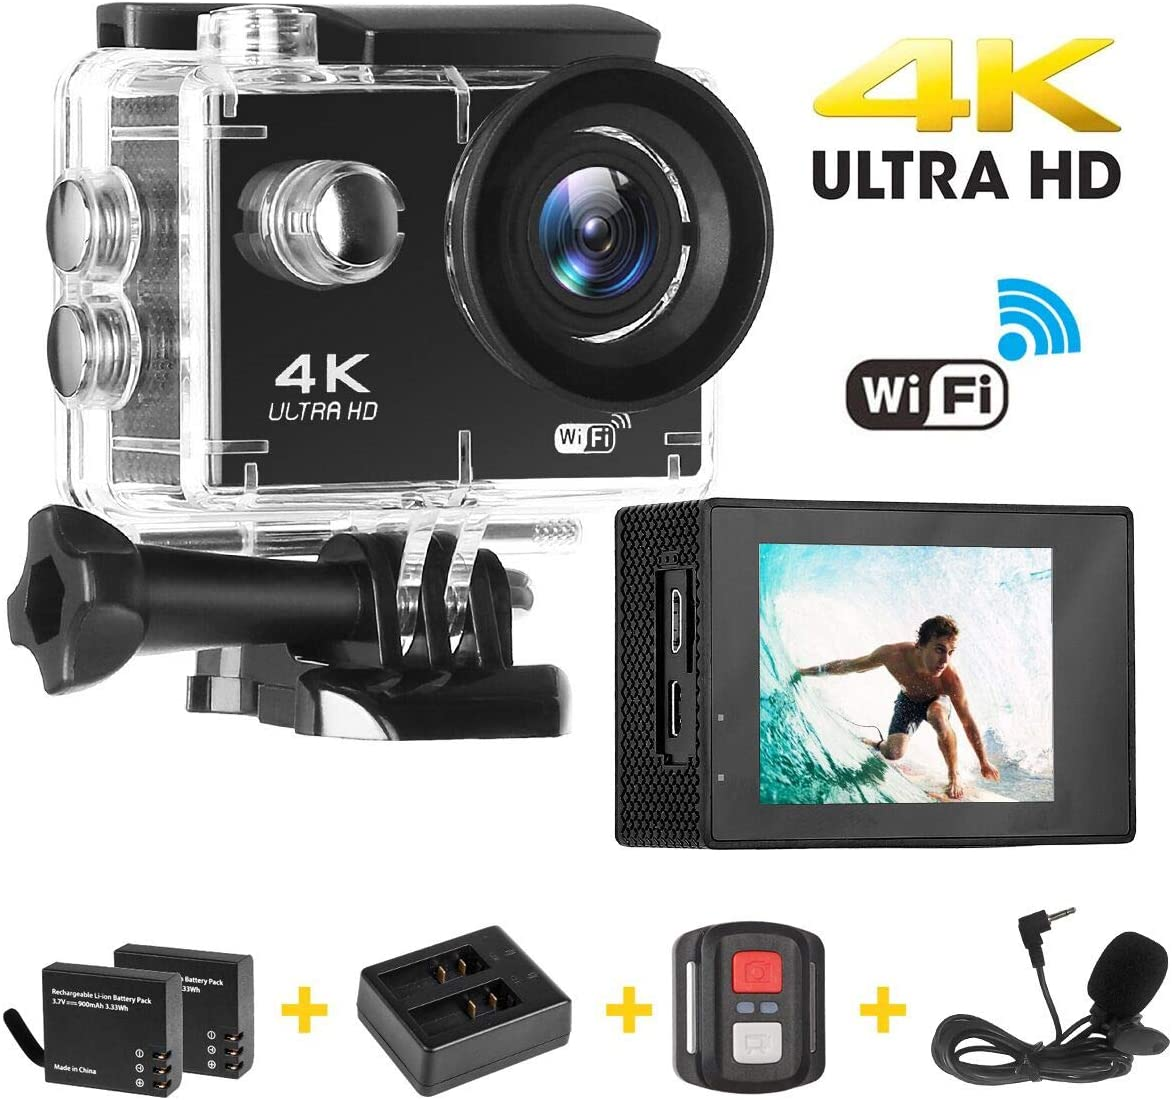 Cámara Deportiva, Acción 4K Ultra HD WiFi Video Cámara/ EIS (Funciones Anti-Shaking) / 2 Recargables 1200mAh Baterías/ Kits de Instalación/ 2.4G Control Remoto/ Impermeable 30M/ Gran Angular de 170°: Amazon.es: Electrónica